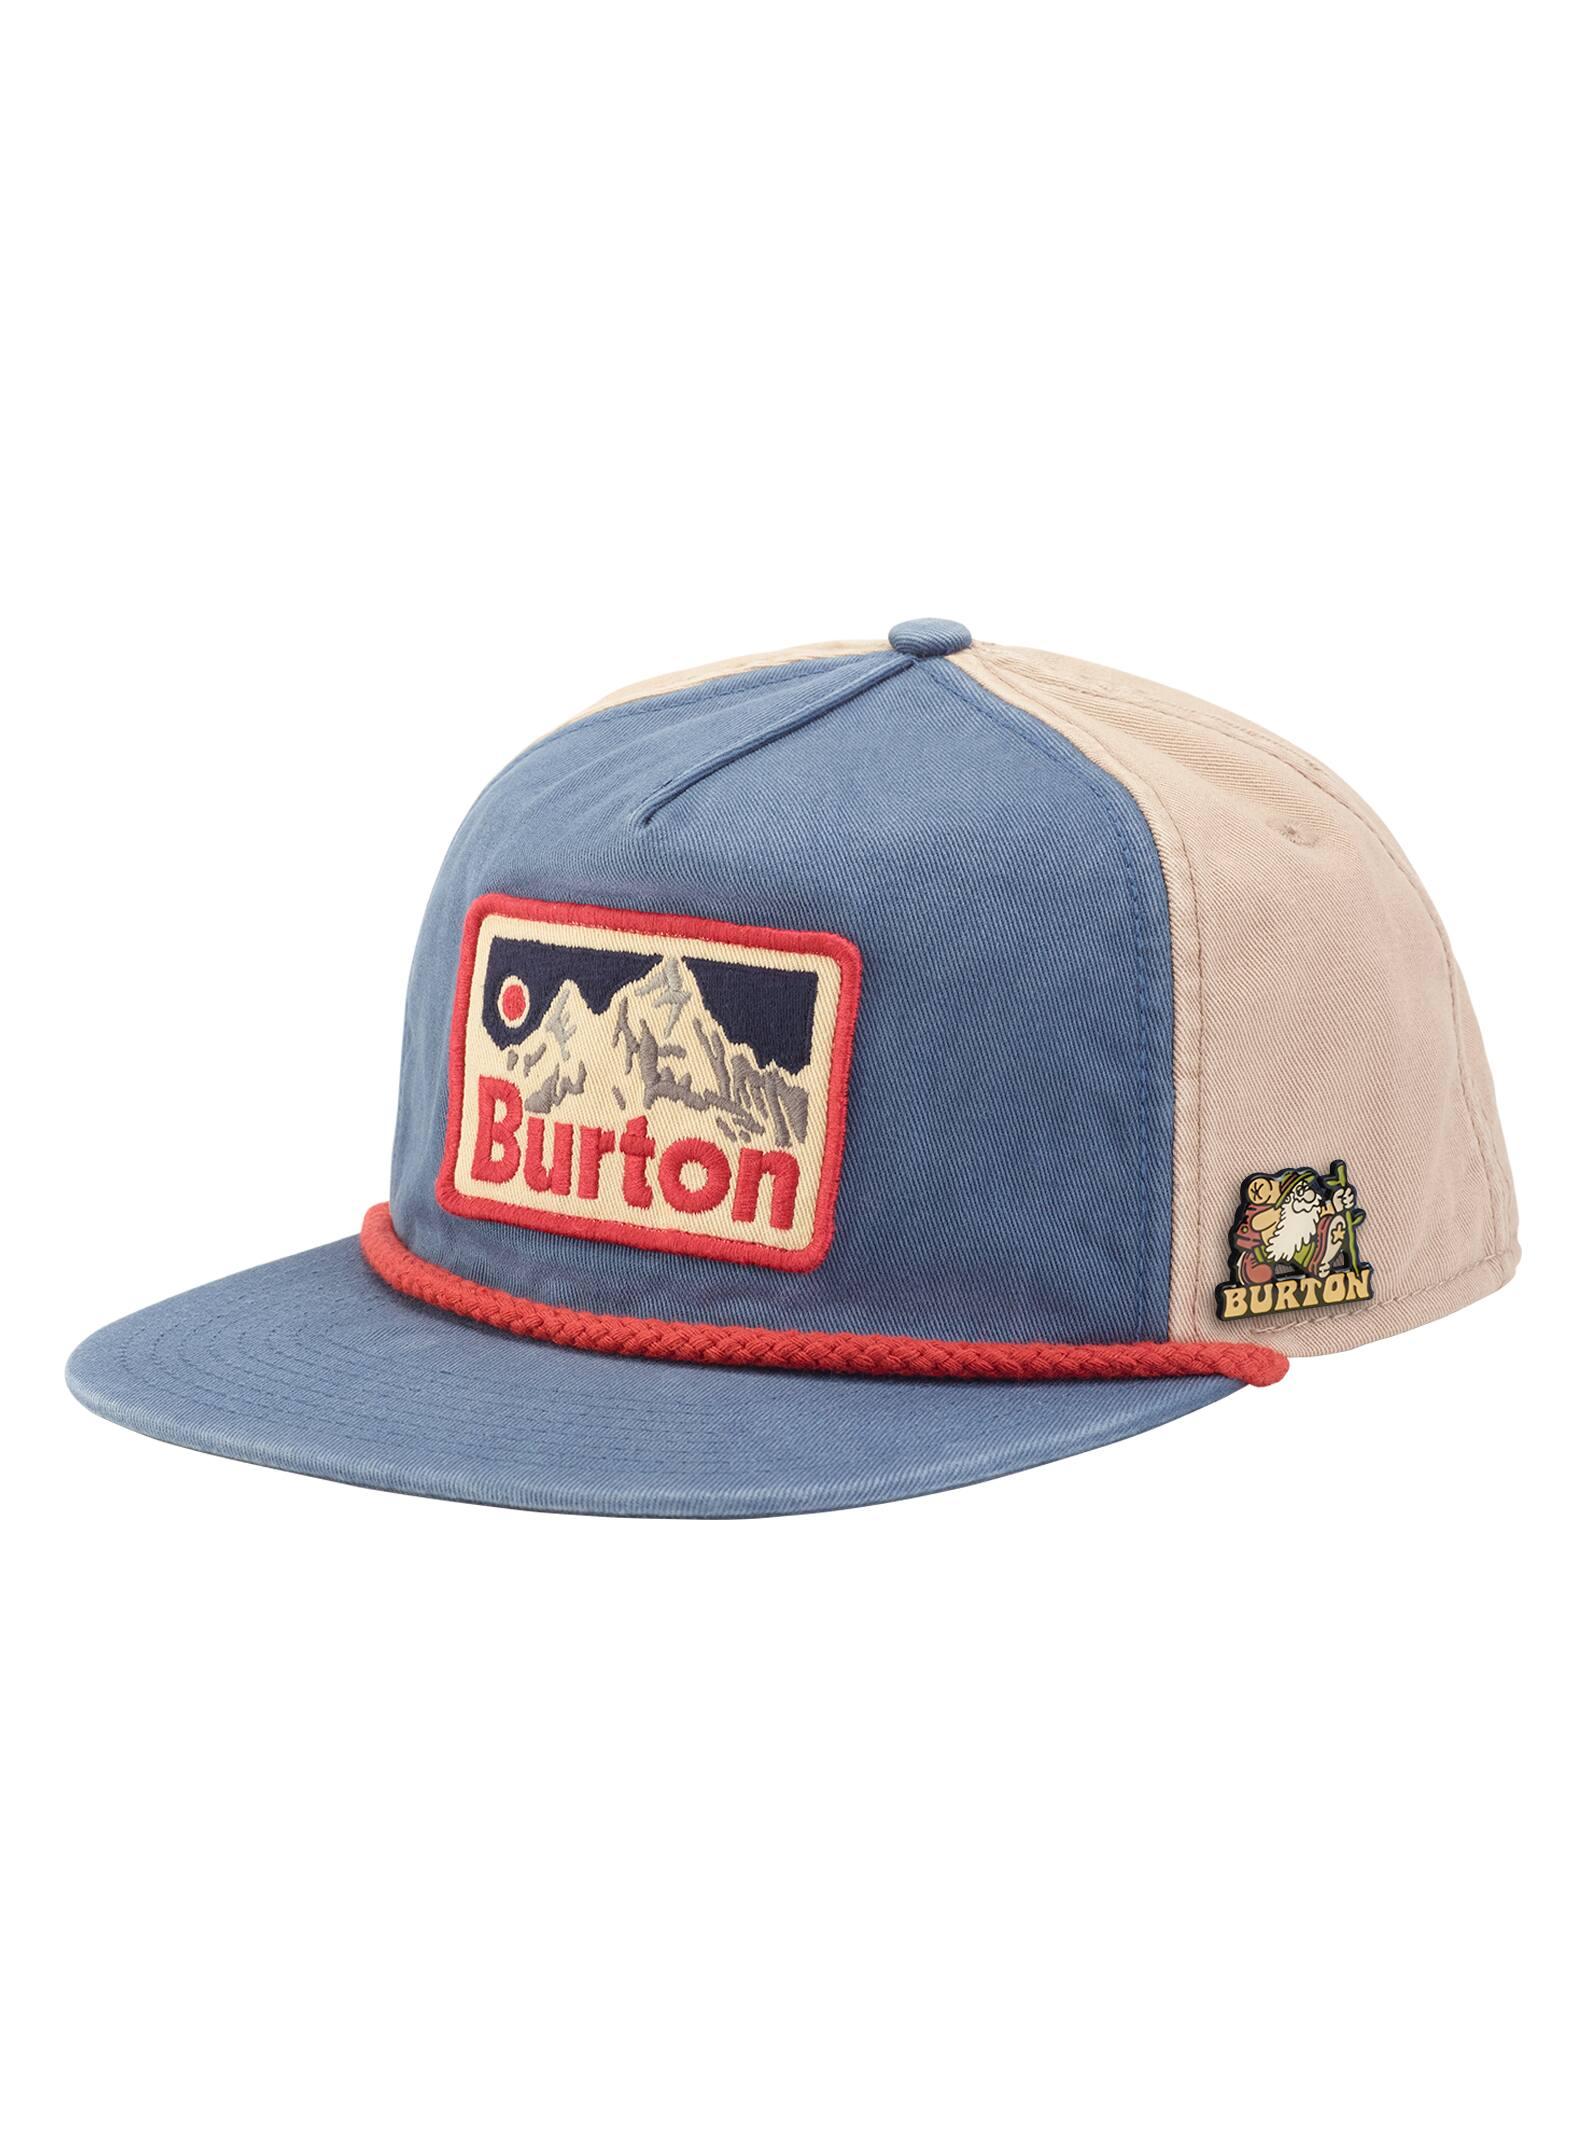 3833f1c3ec292 Men s Hats   Beanies